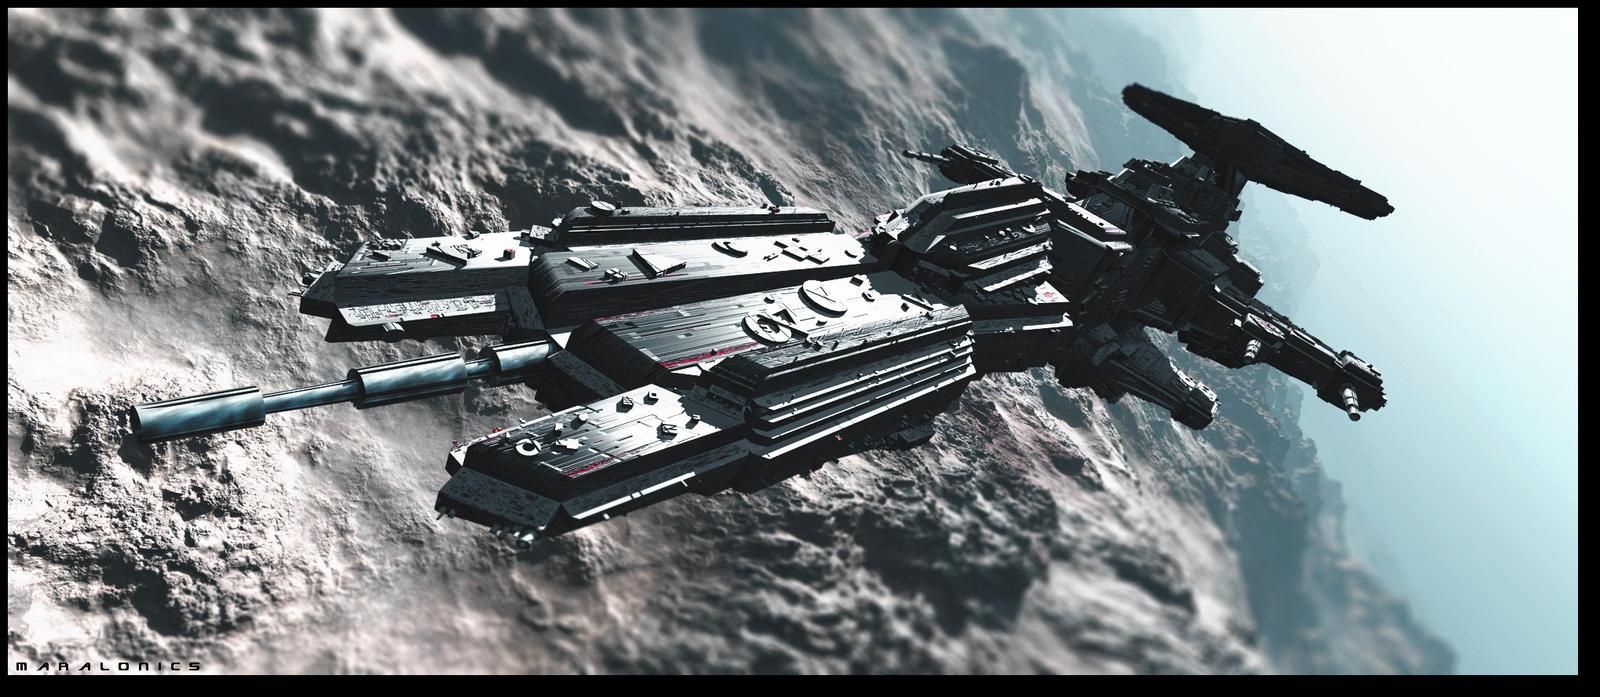 Starfly X-4 by Maralonics